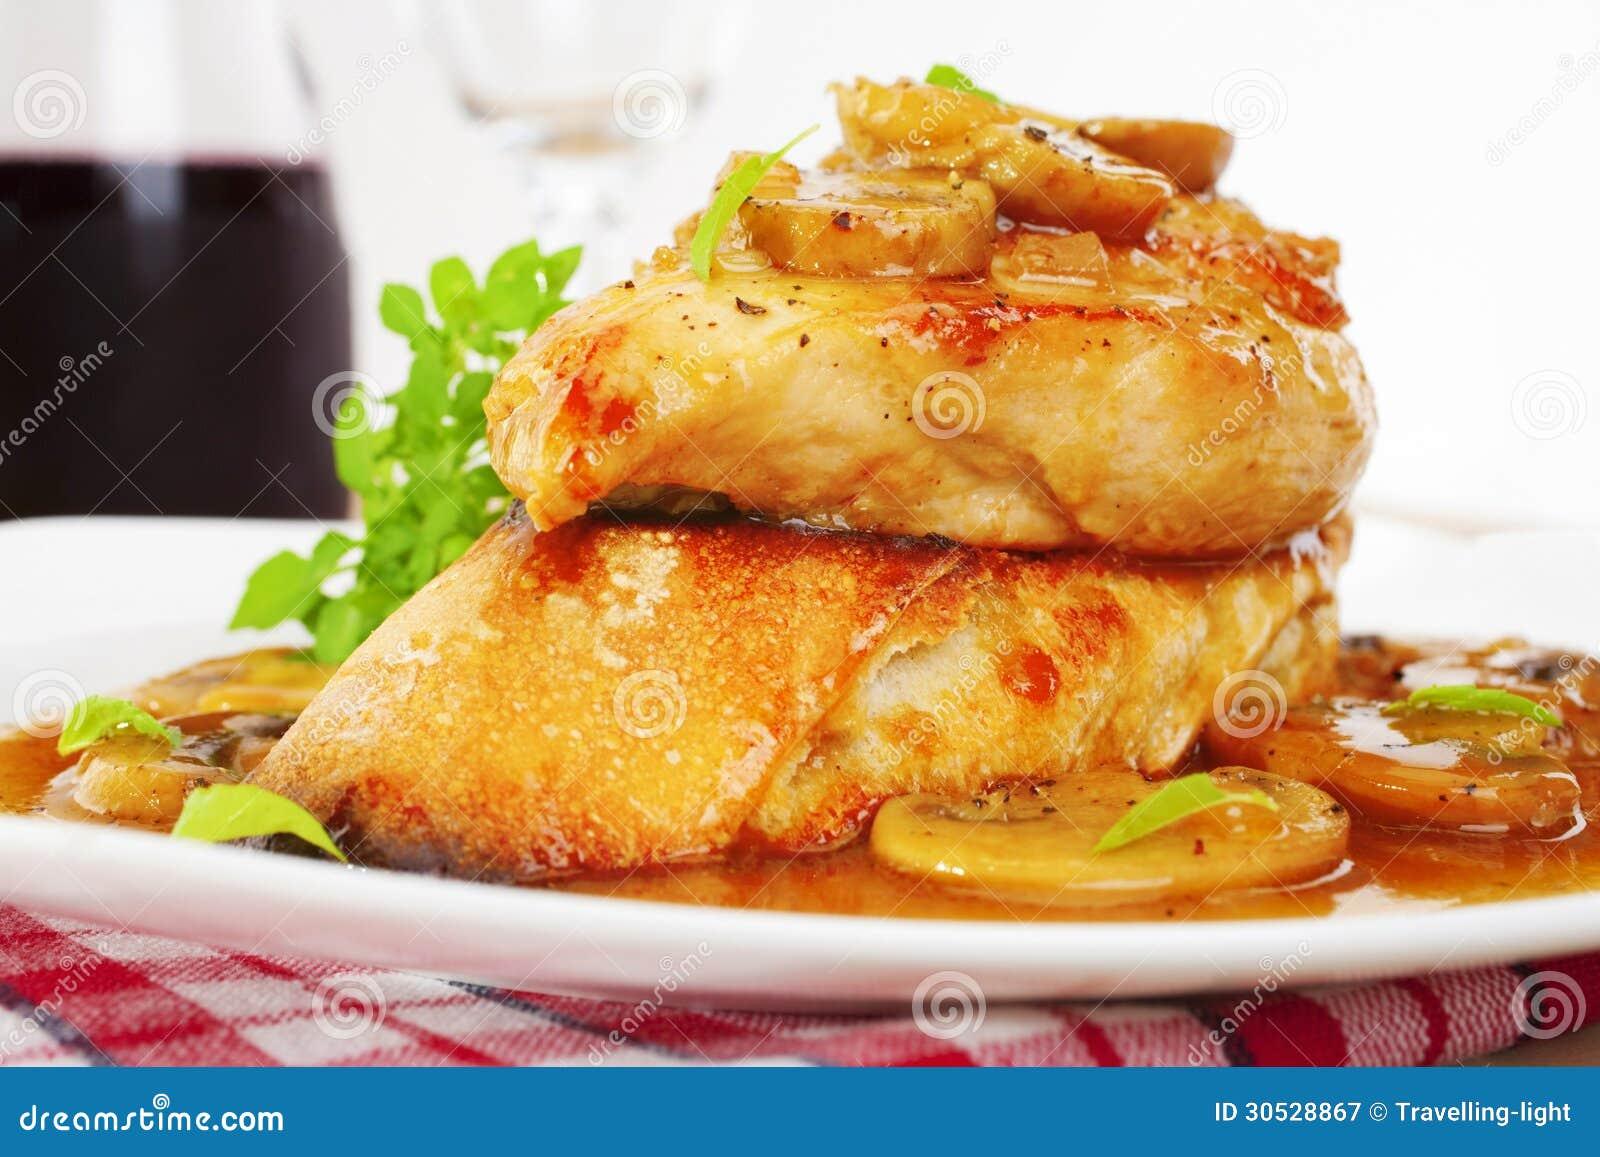 Chicken marsala italian food royalty free stock for American italian cuisine